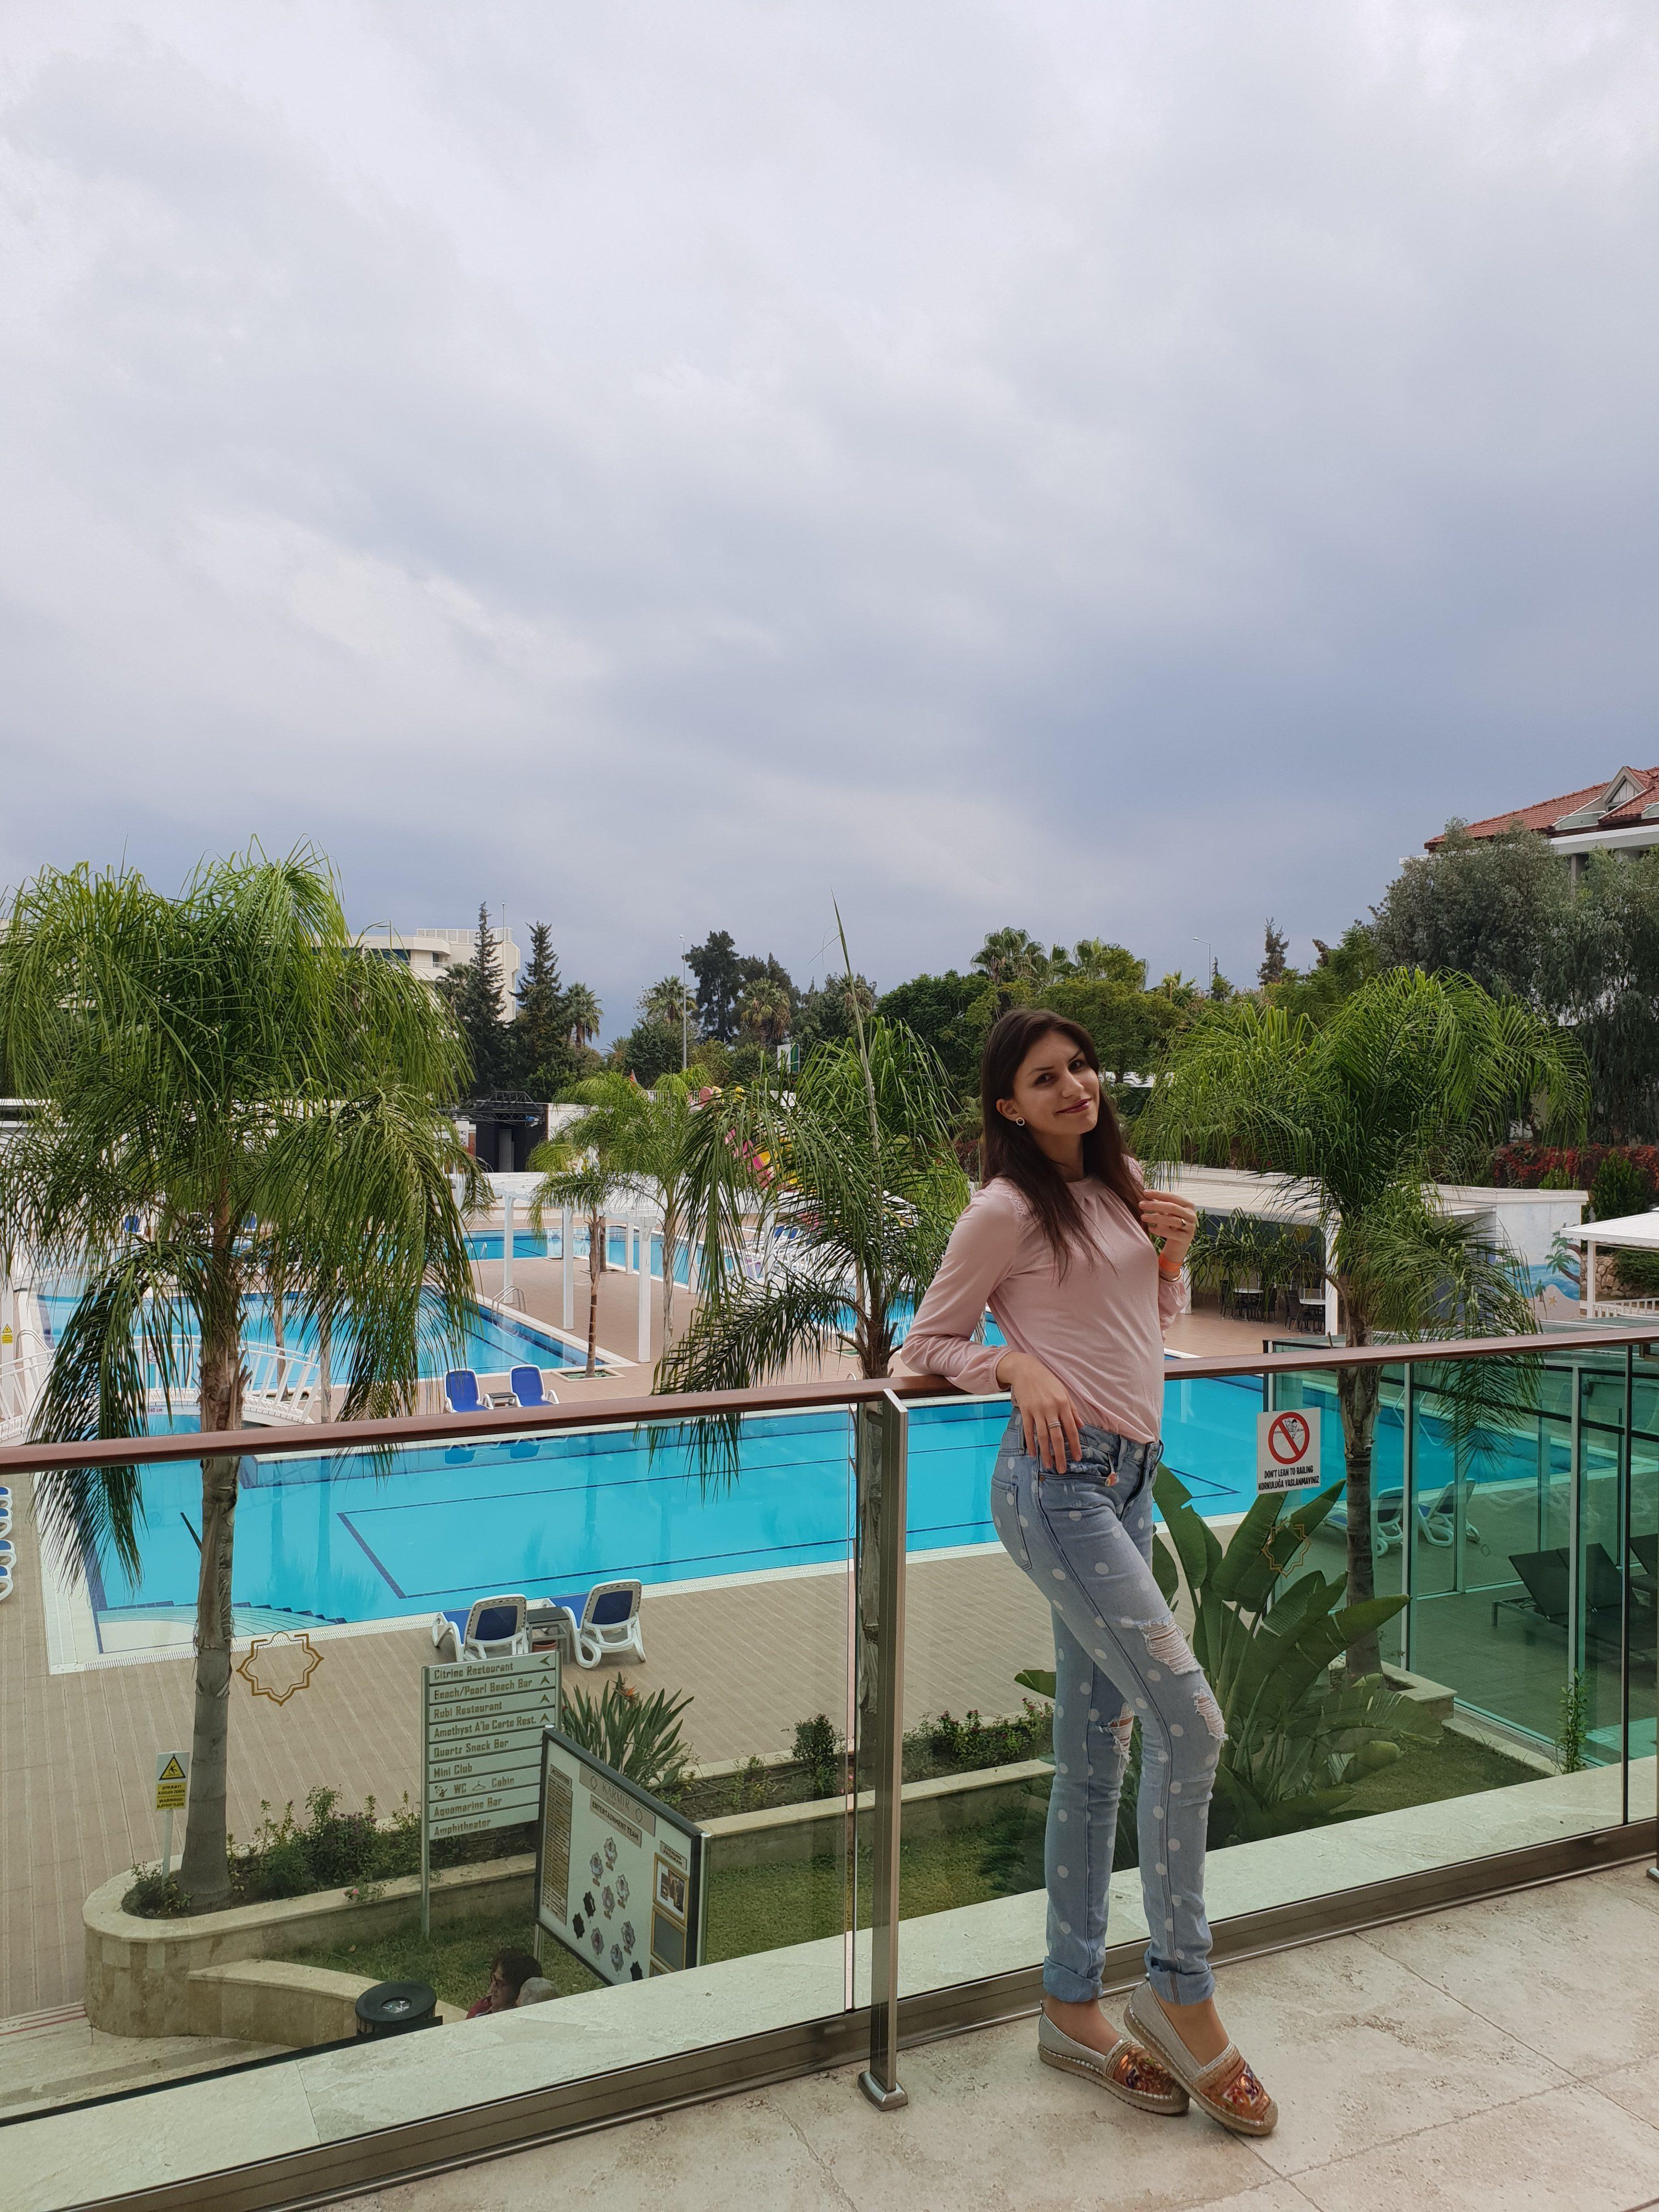 Excursie de vis in Turcia : Antalya - Coasta Licia- Myra - Efes- Pamukkale 2